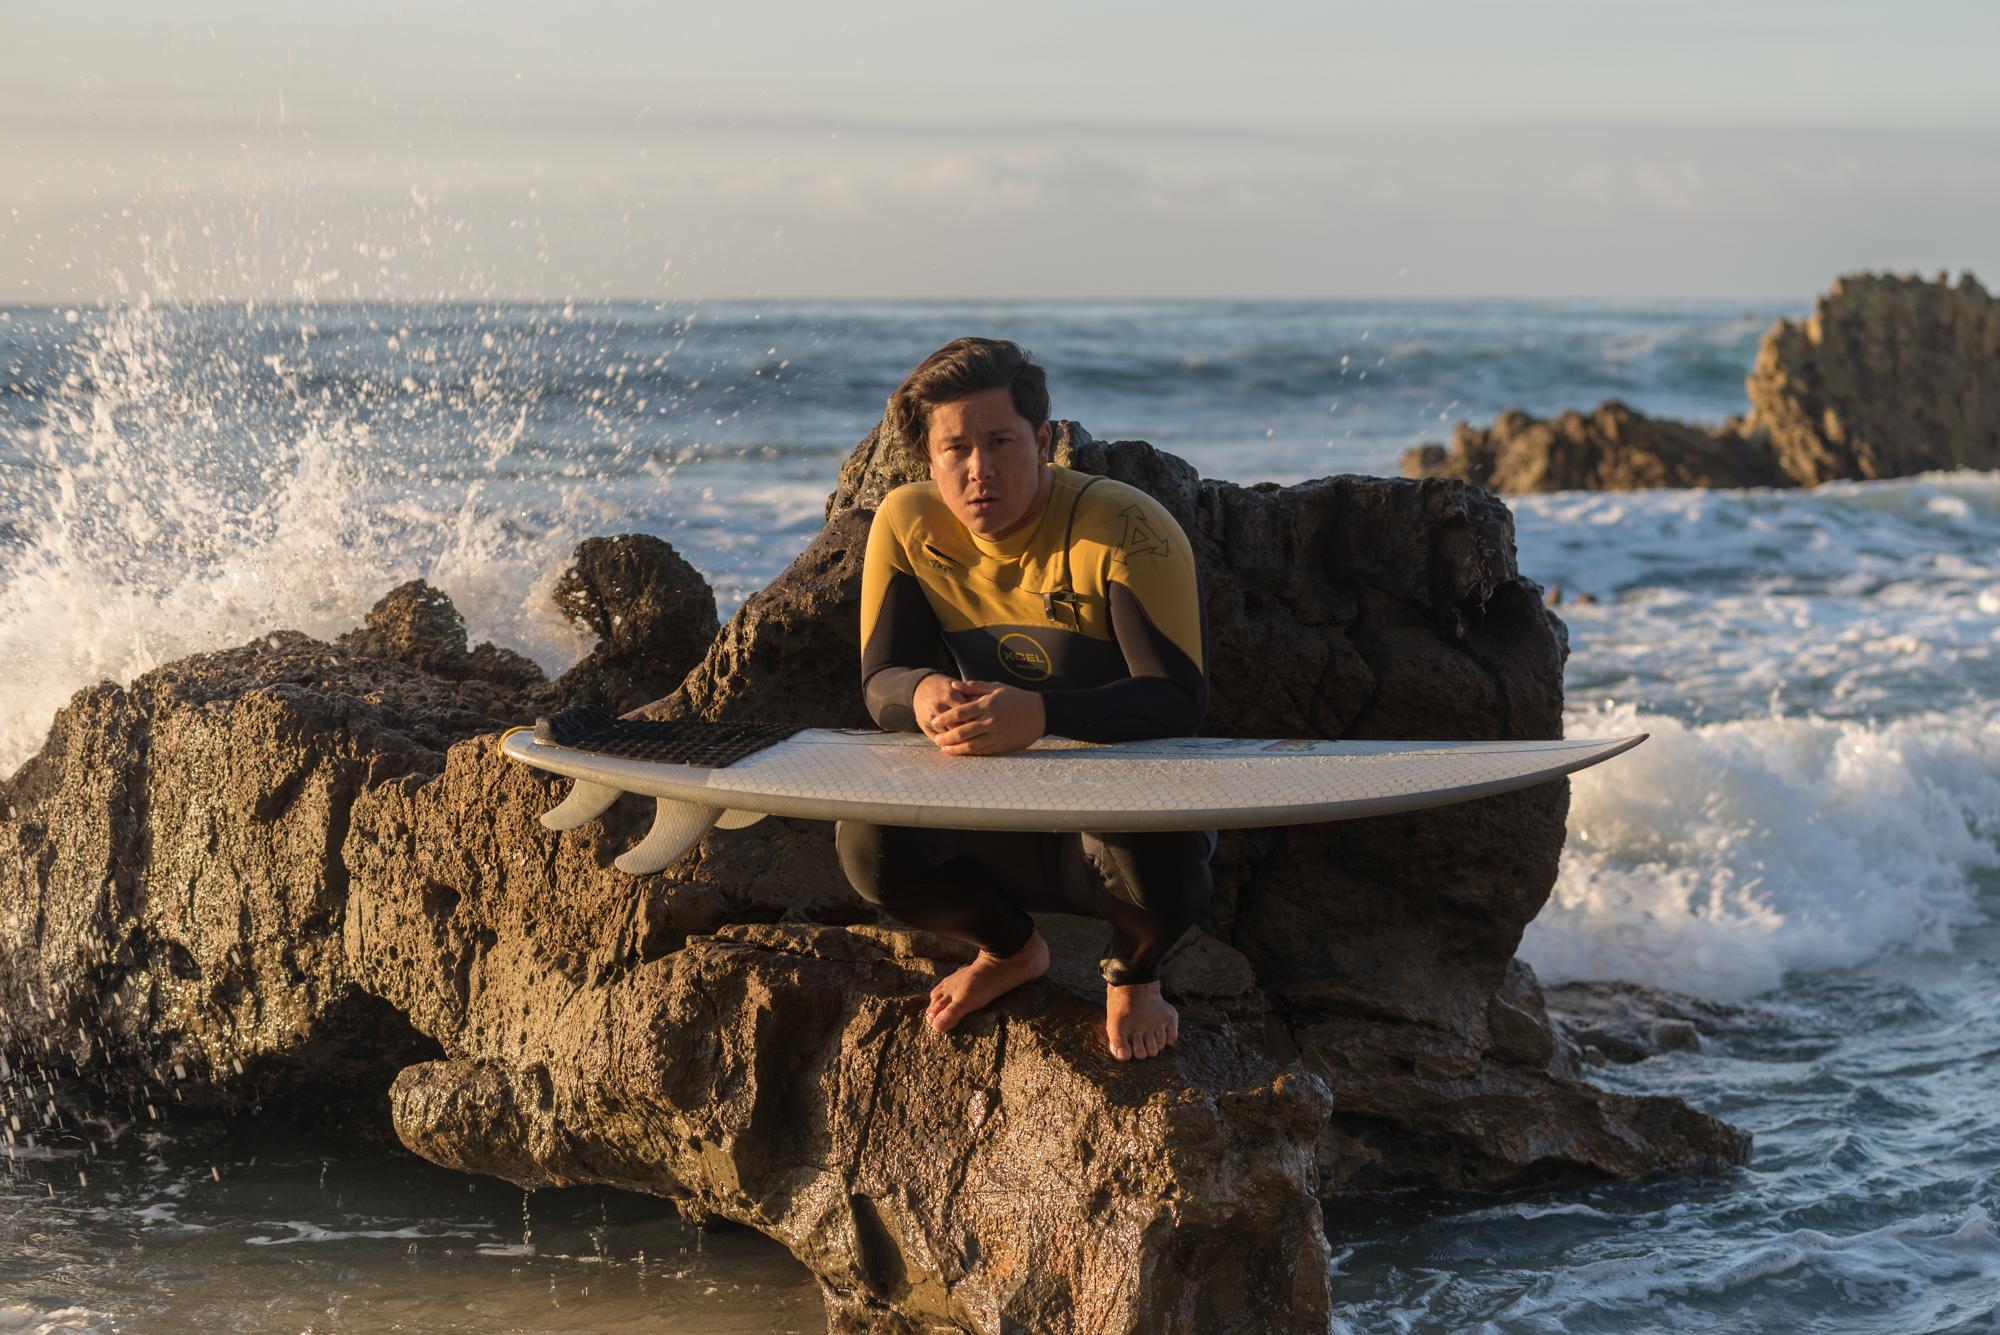 Surfer-Environmental-Portrait_Active-Lifestyle-Photography012.JPG